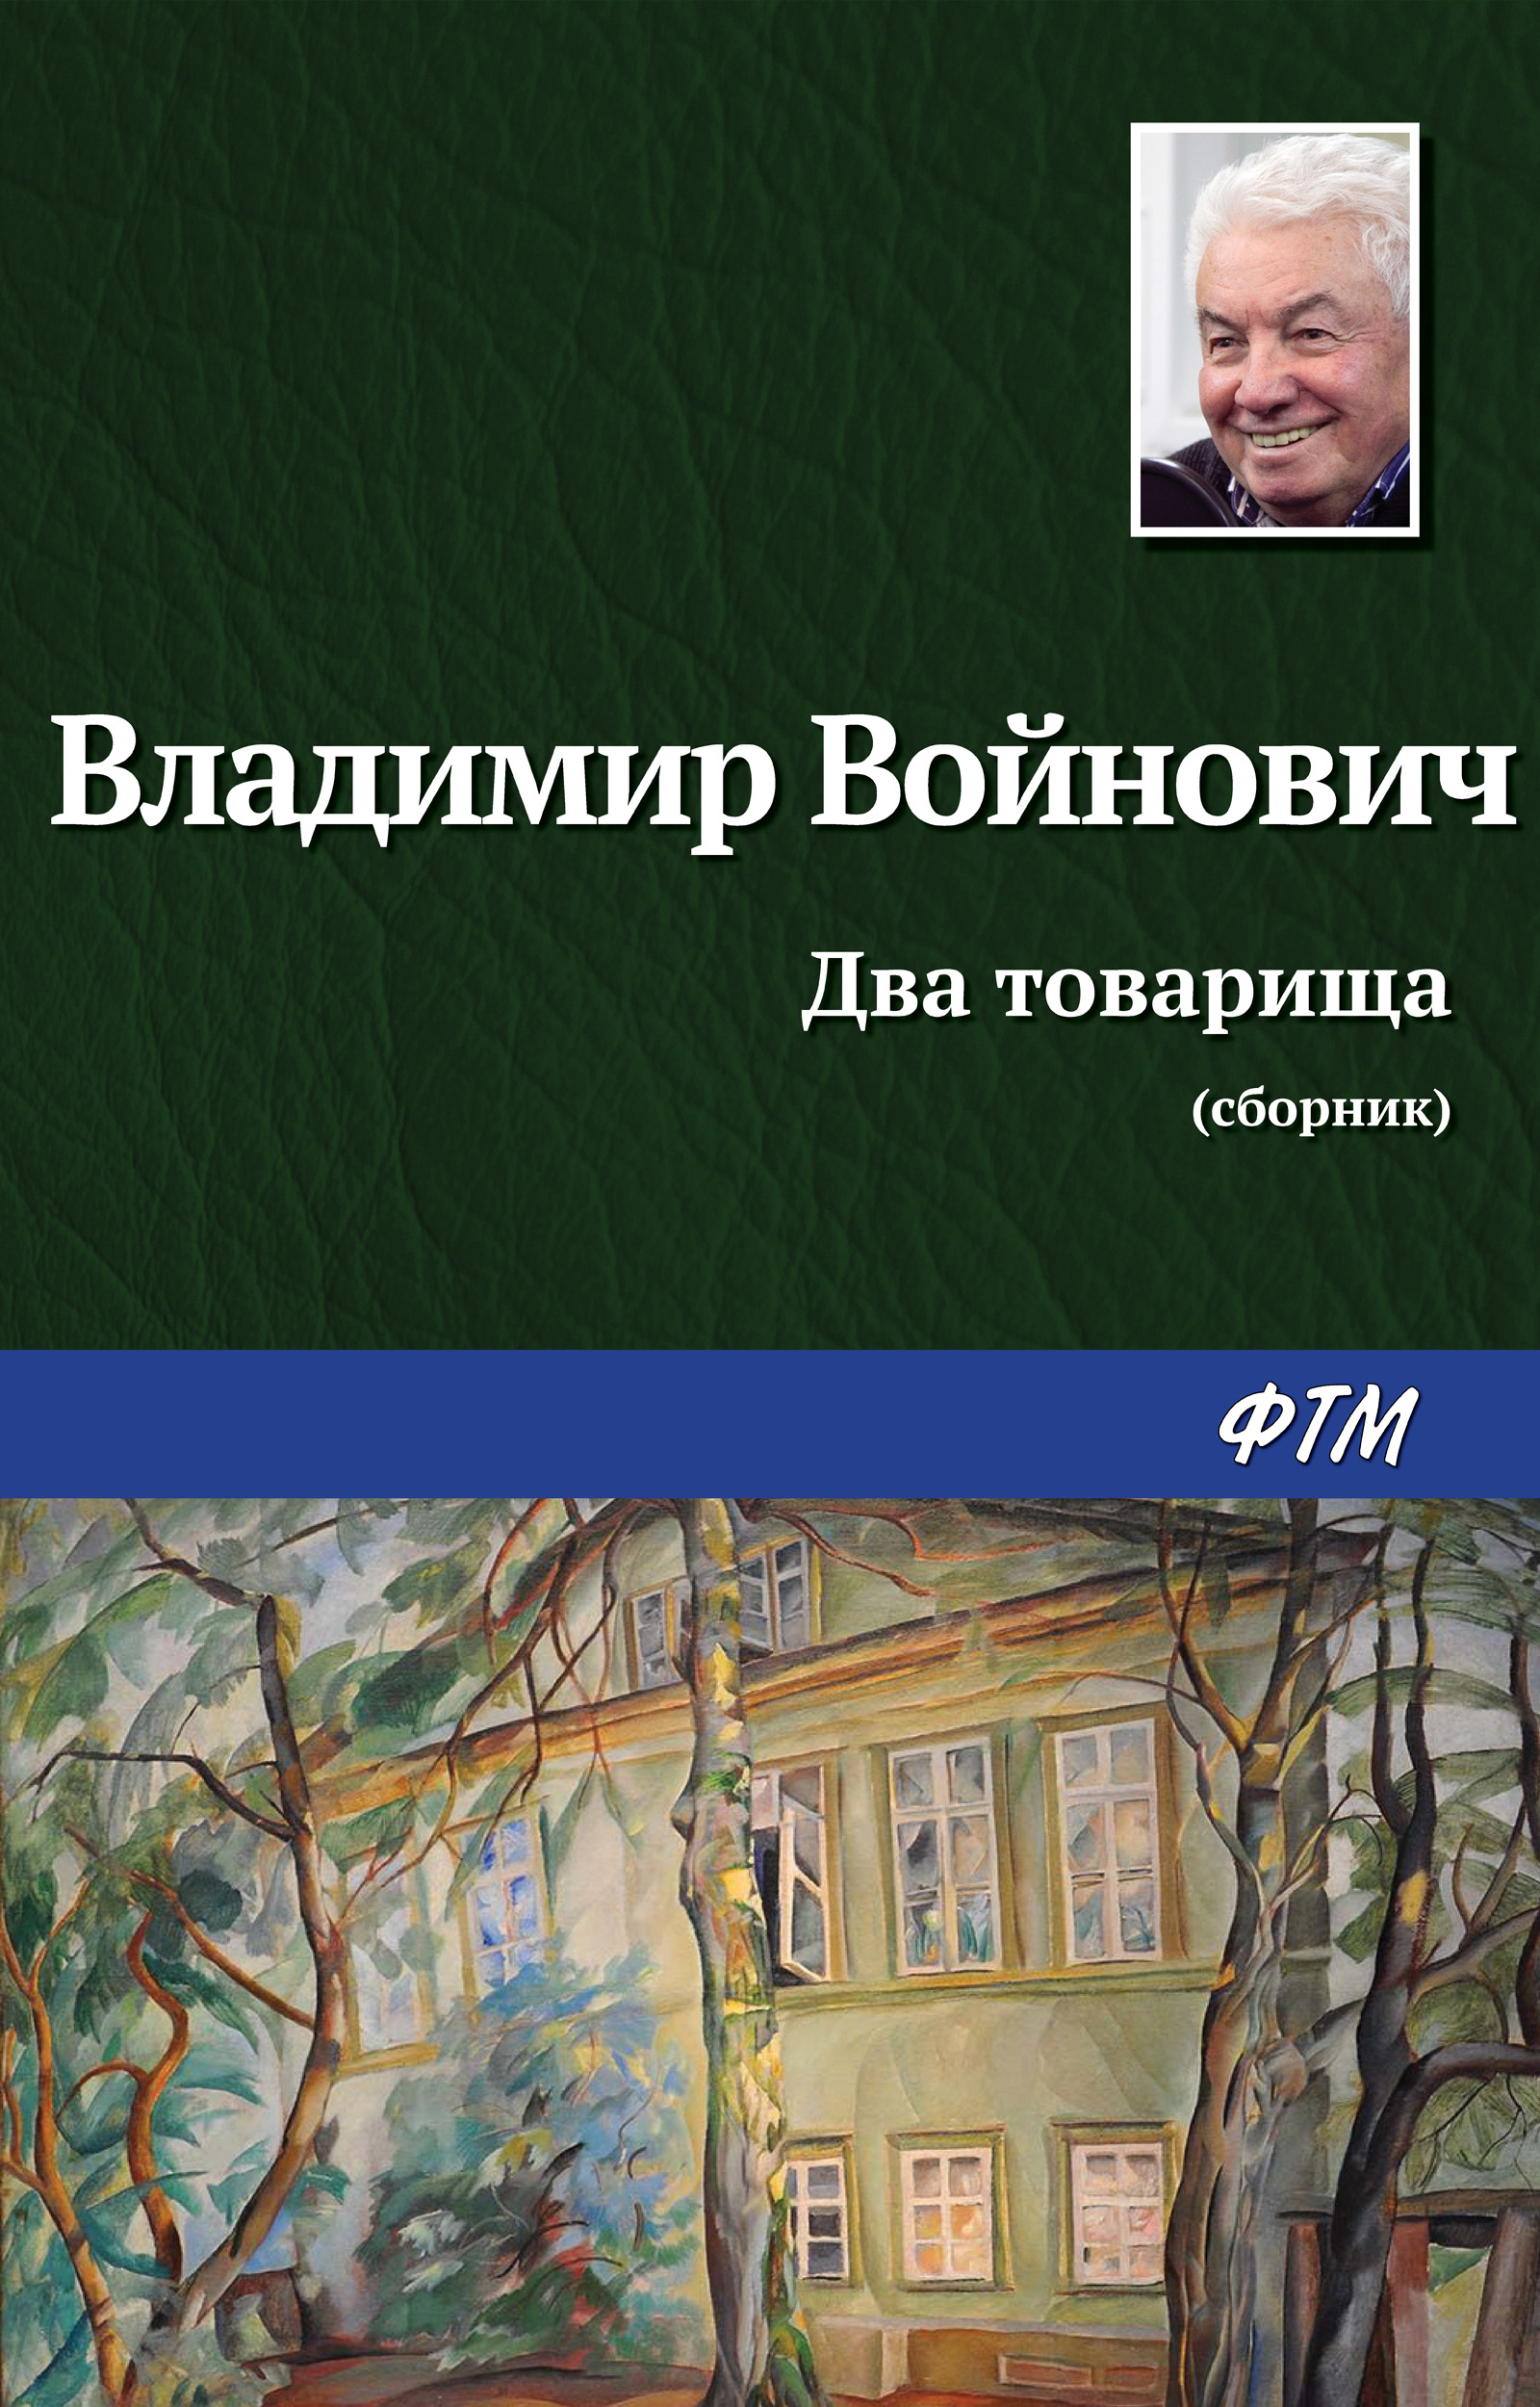 Владимир Войнович Два товарища (сборник)